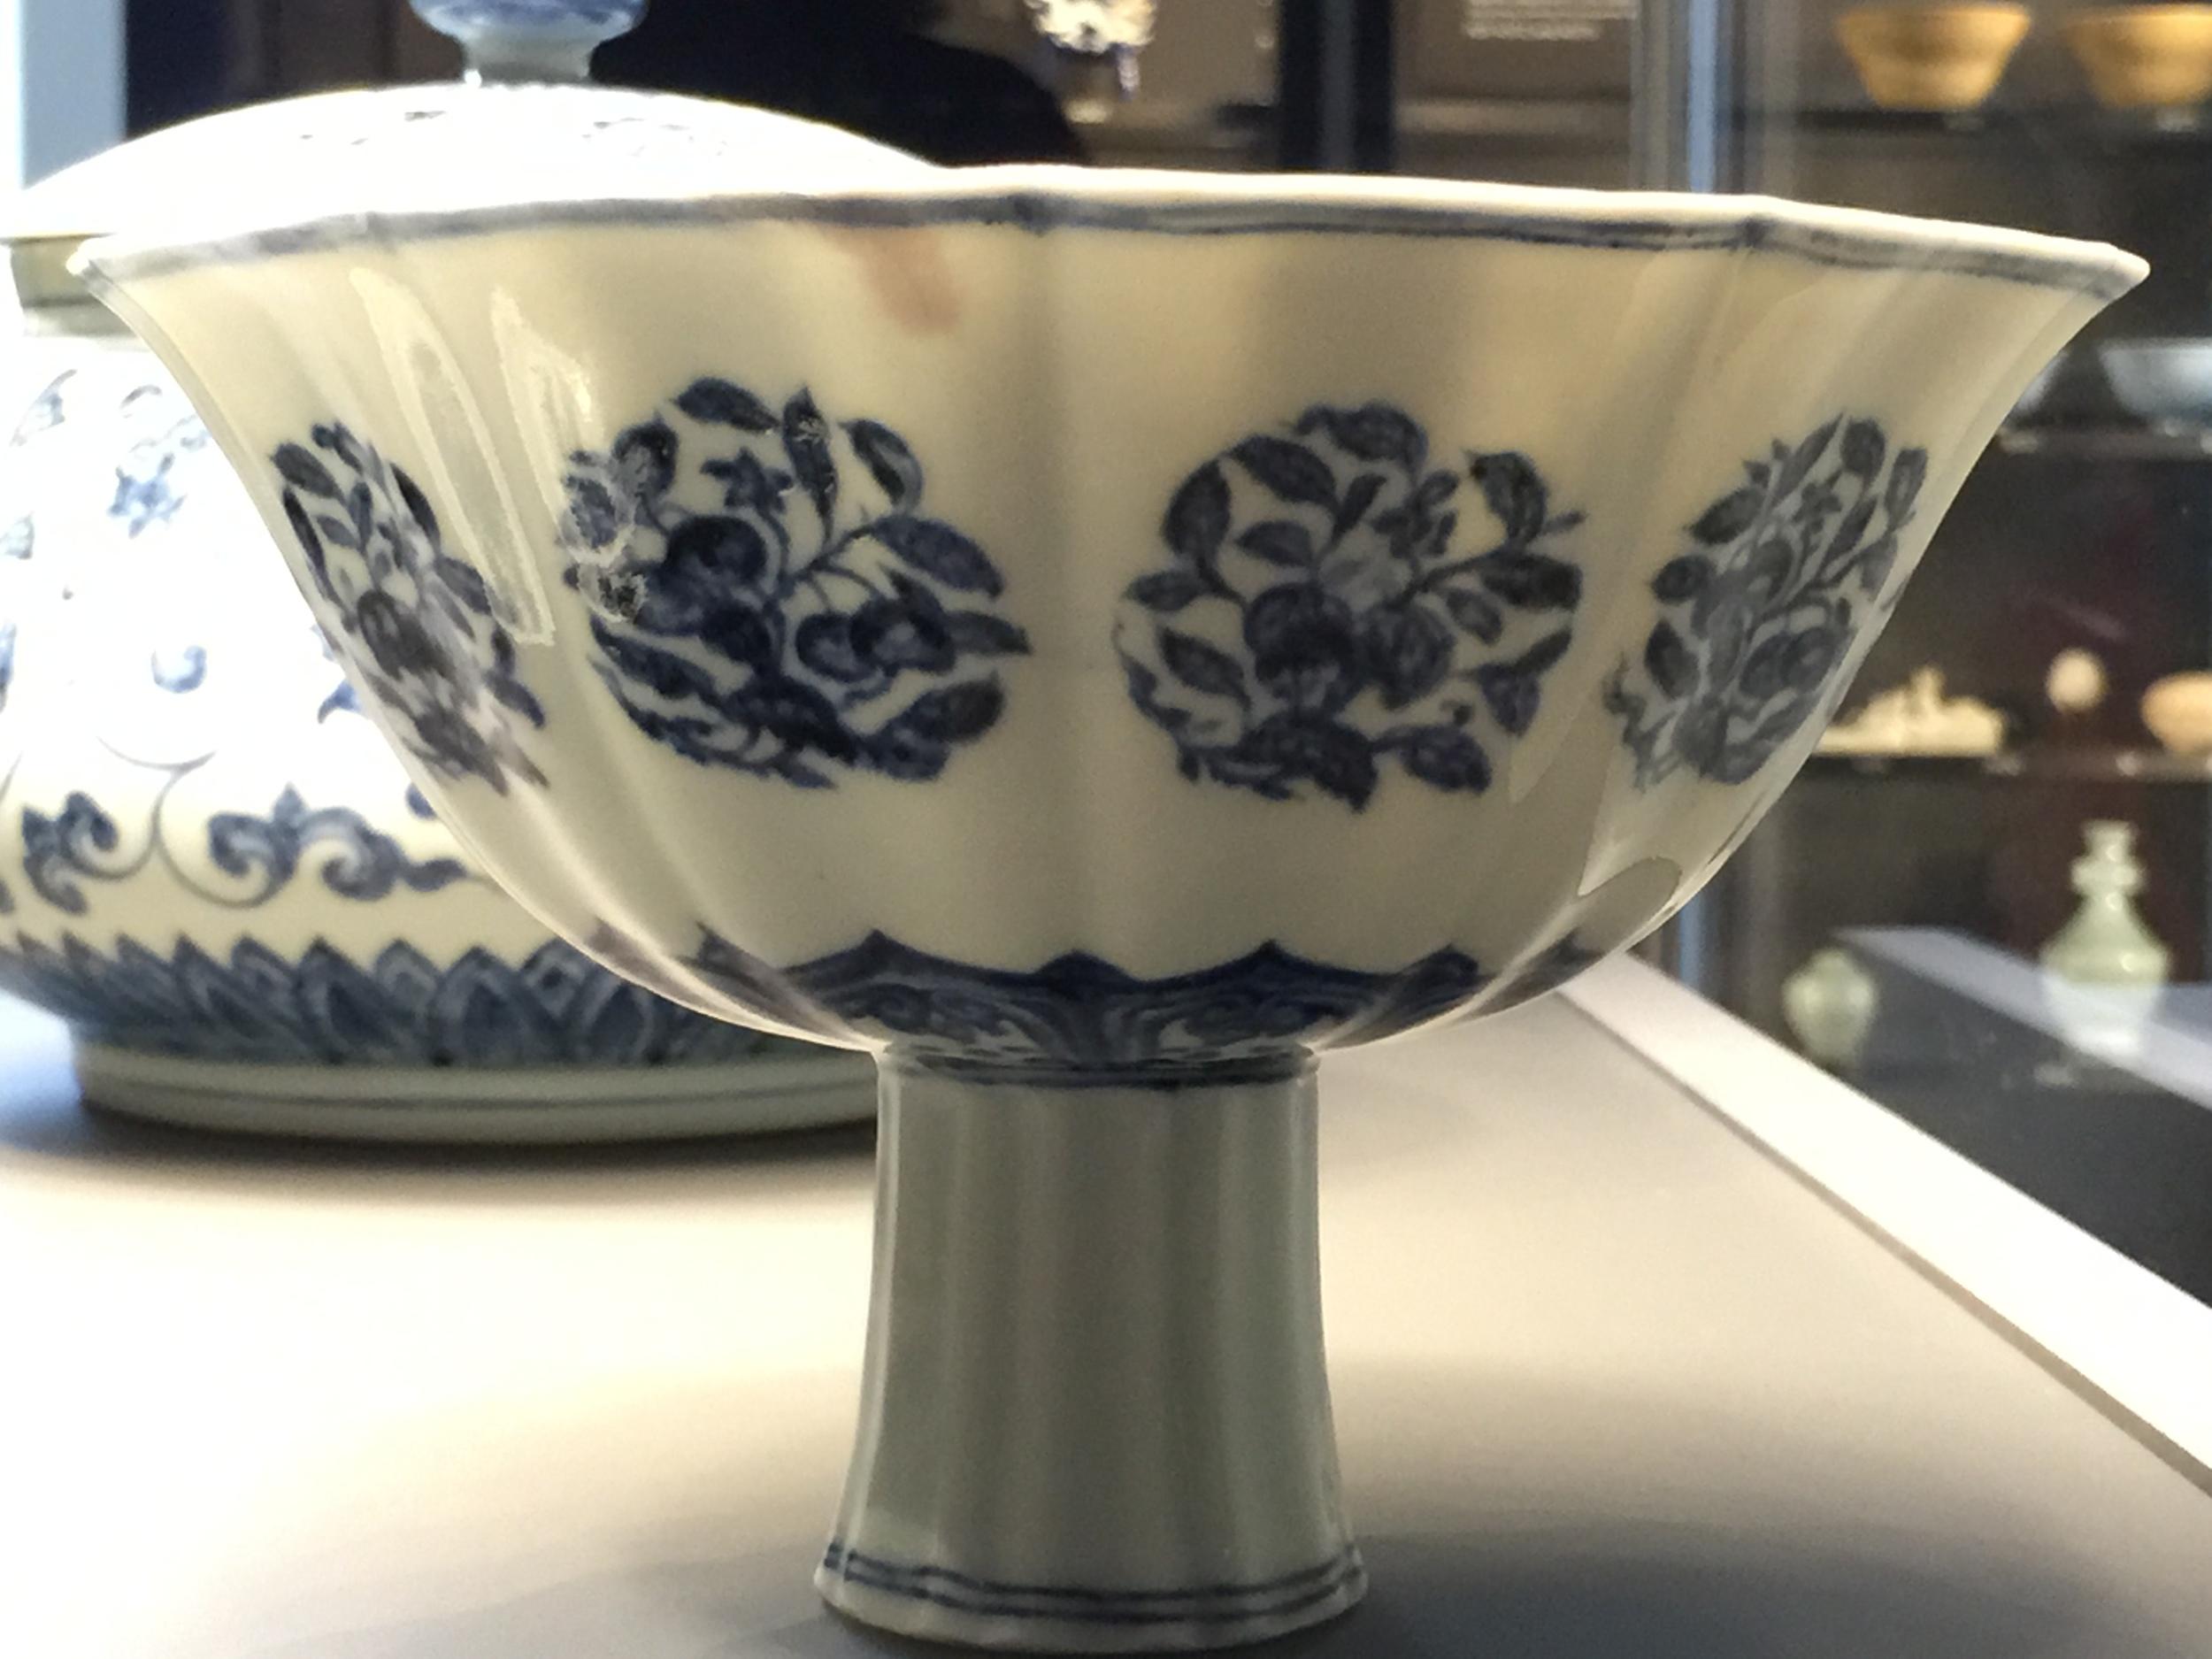 Chinese-Porcelain-British-Museum-Percival-David-jessewaugh.com-60.jpg